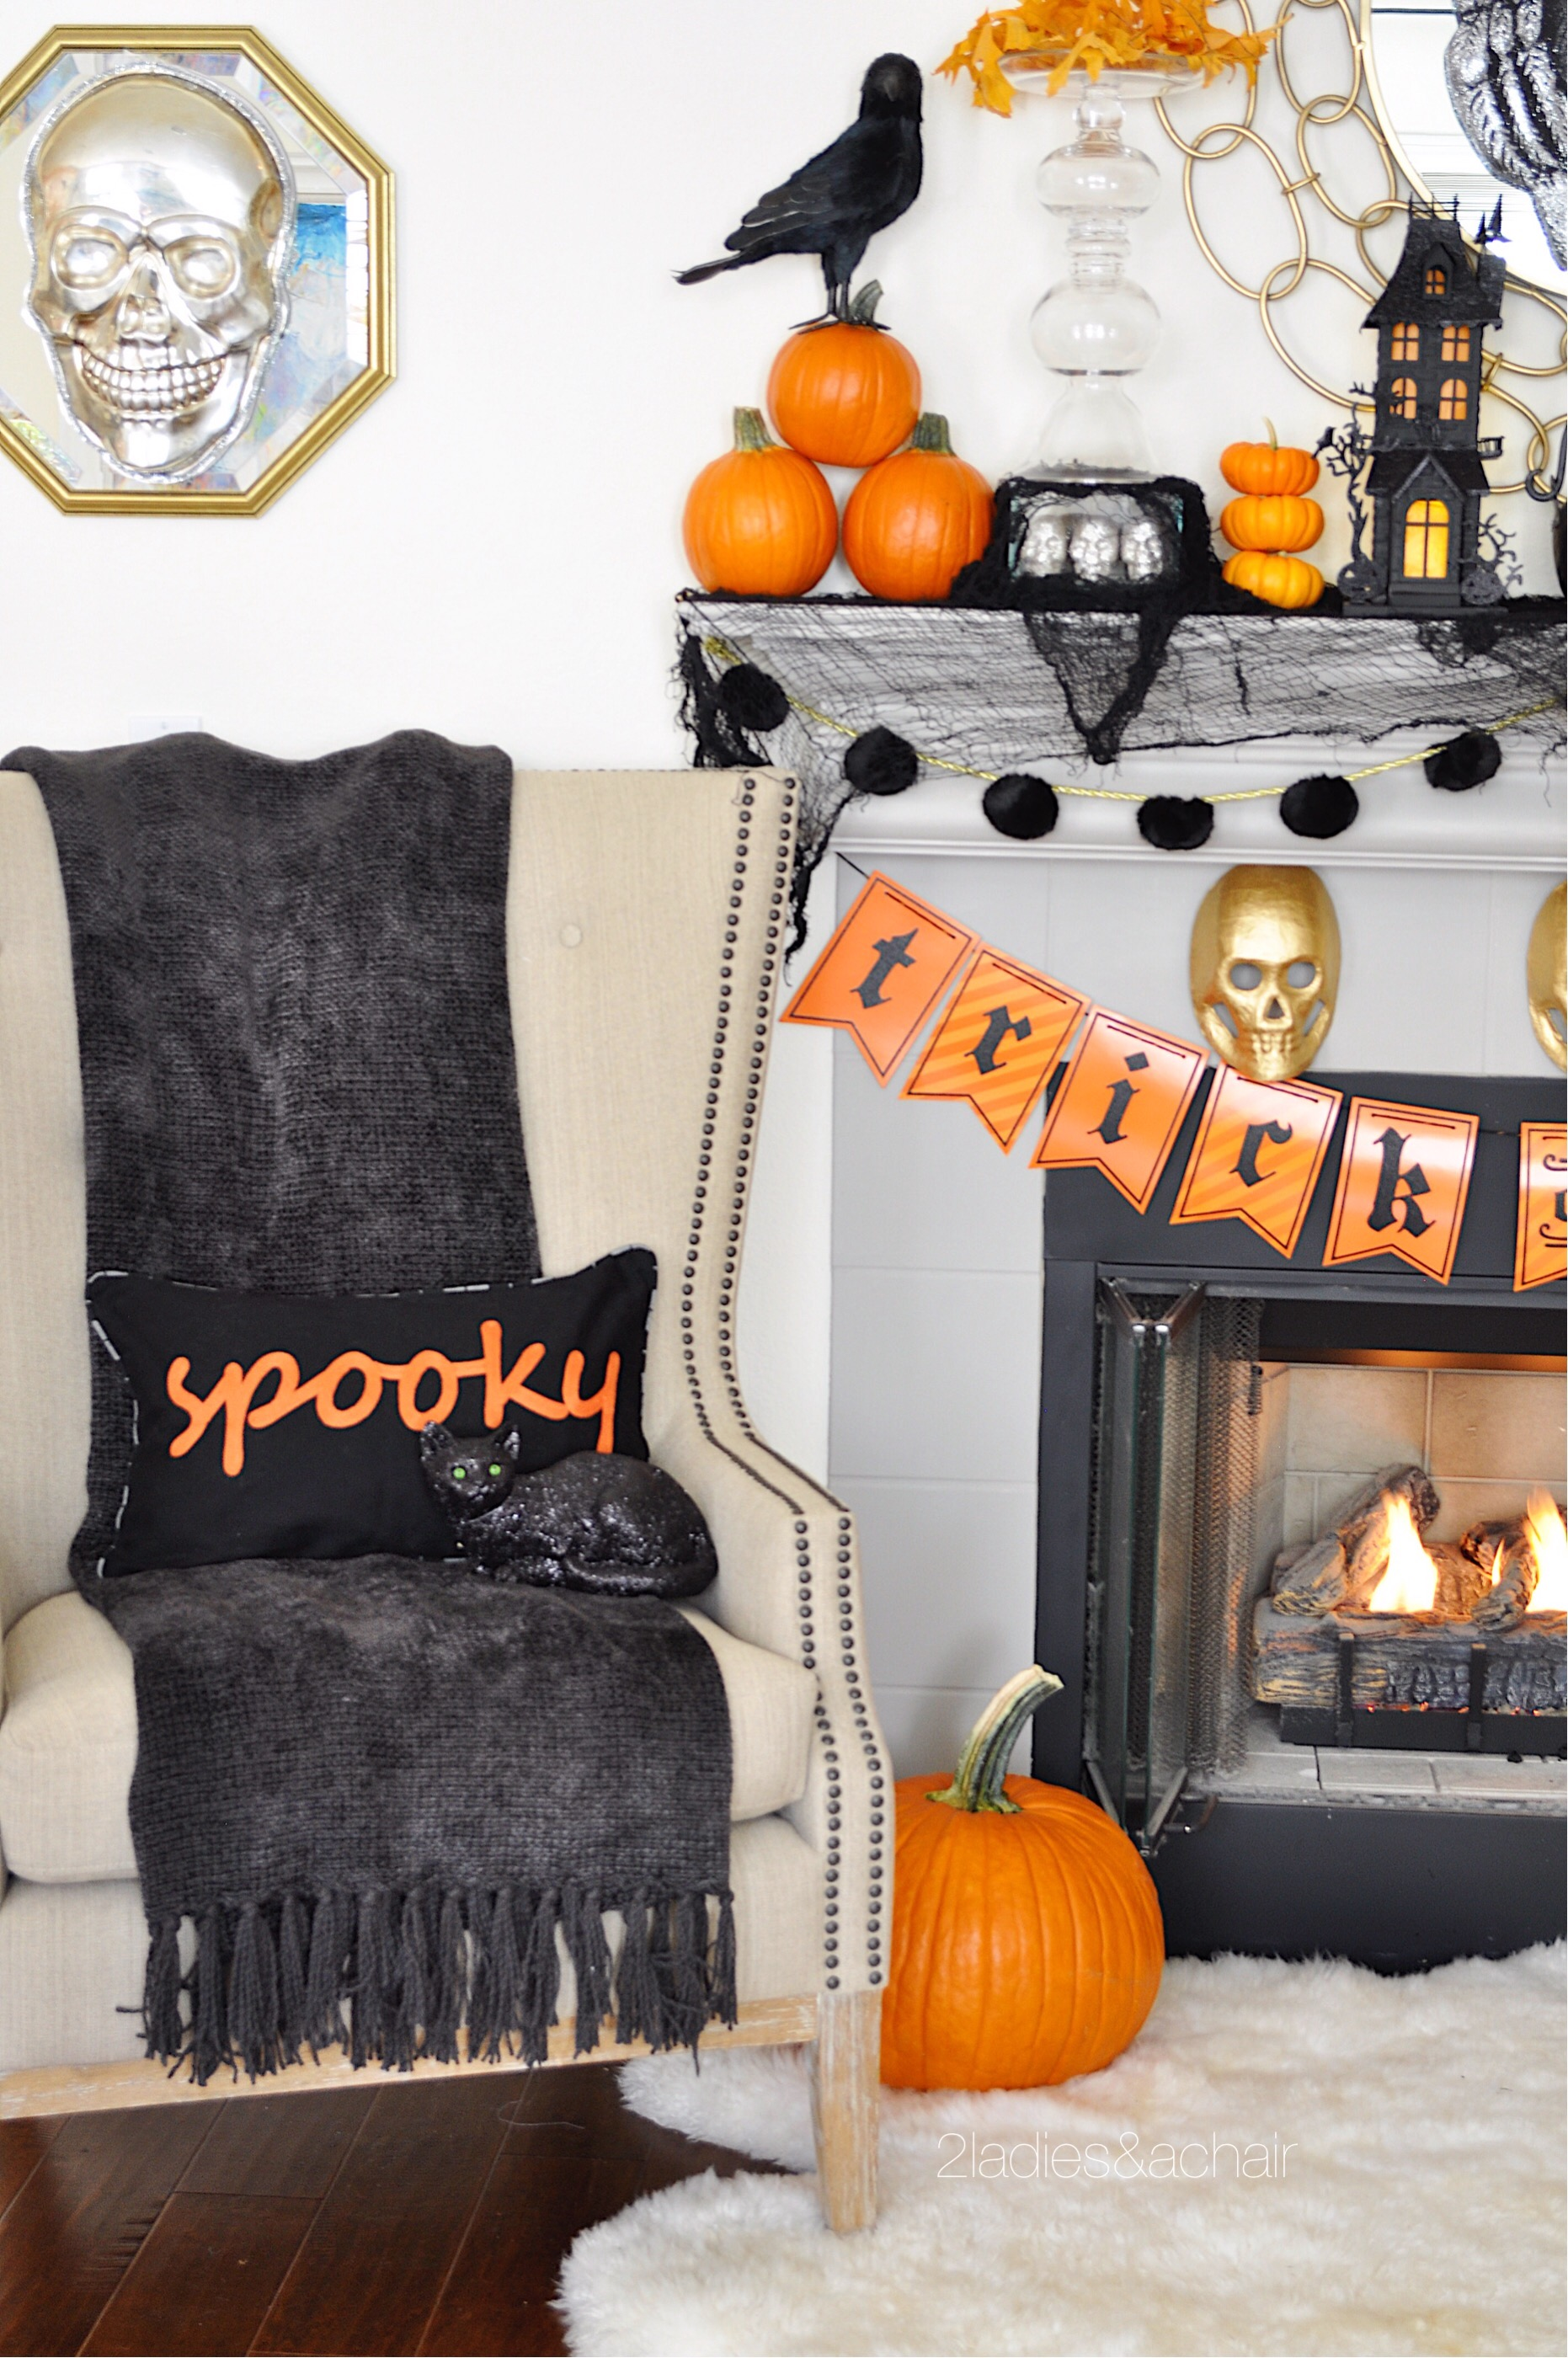 halloween mantel decorations FullSizeRender(84).jpg